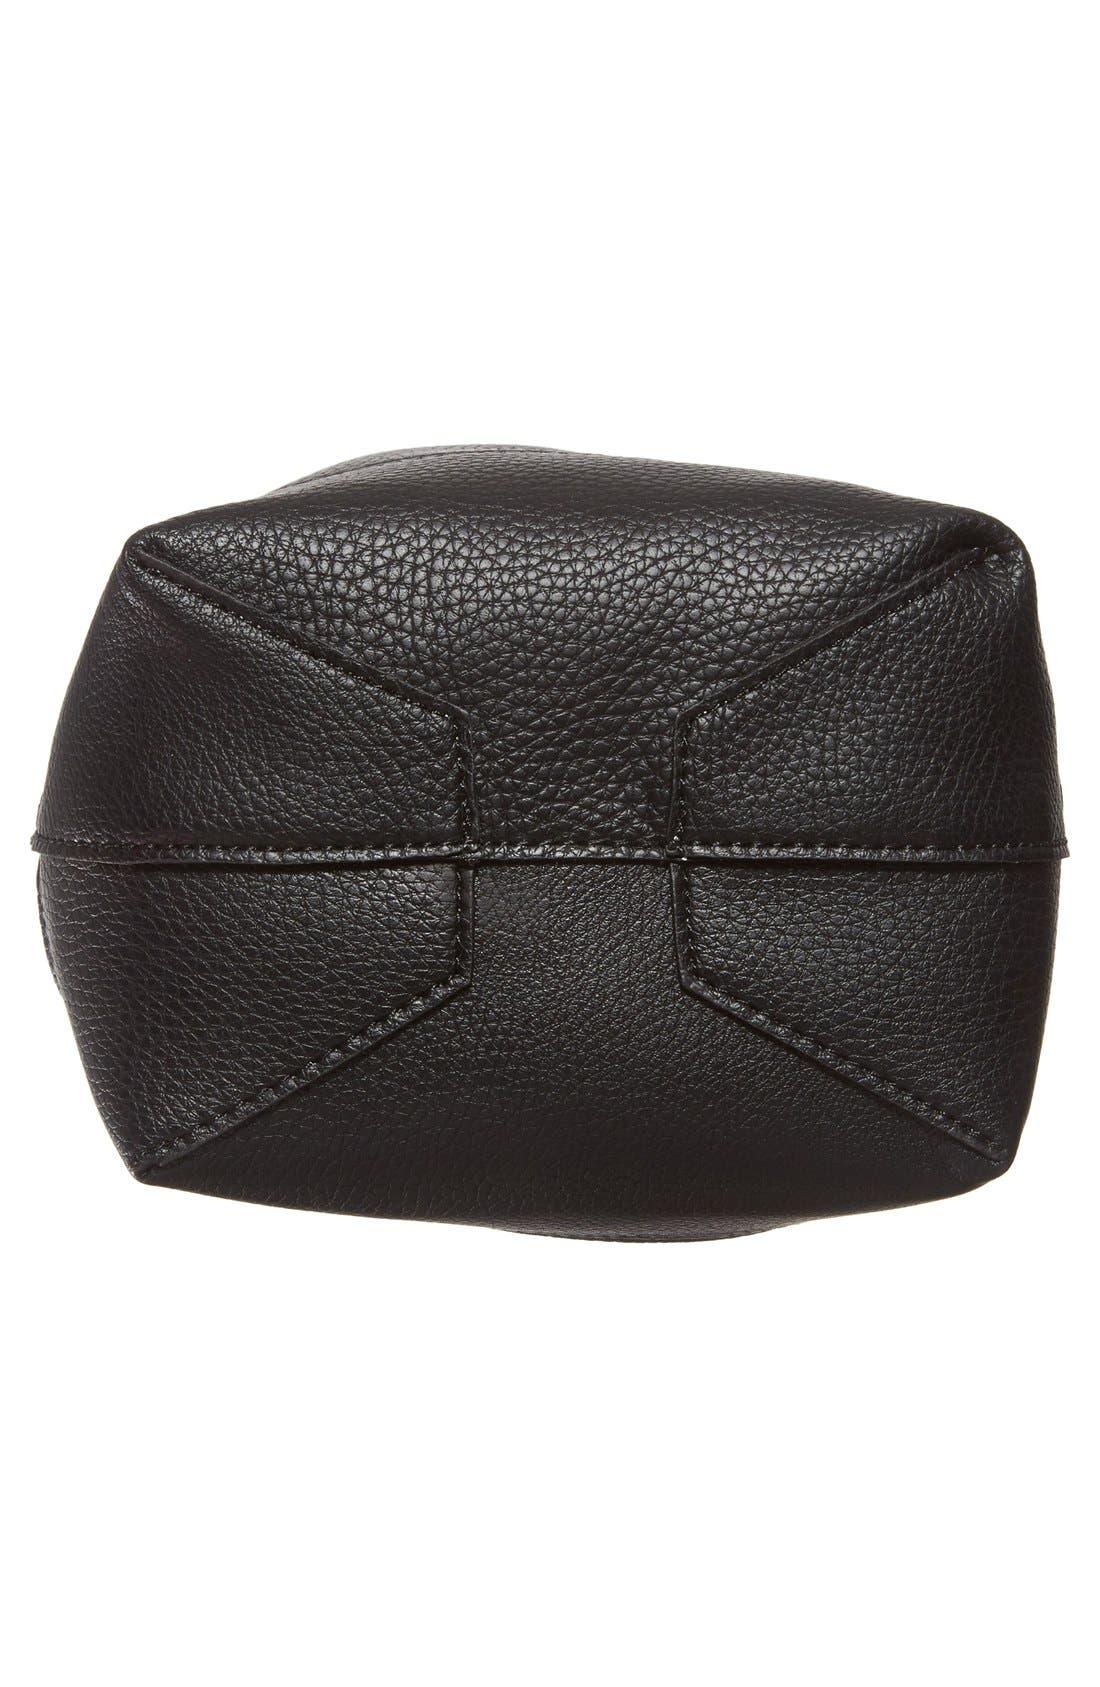 STREET LEVEL, Faux Leather Bucket Bag, Alternate thumbnail 4, color, 001